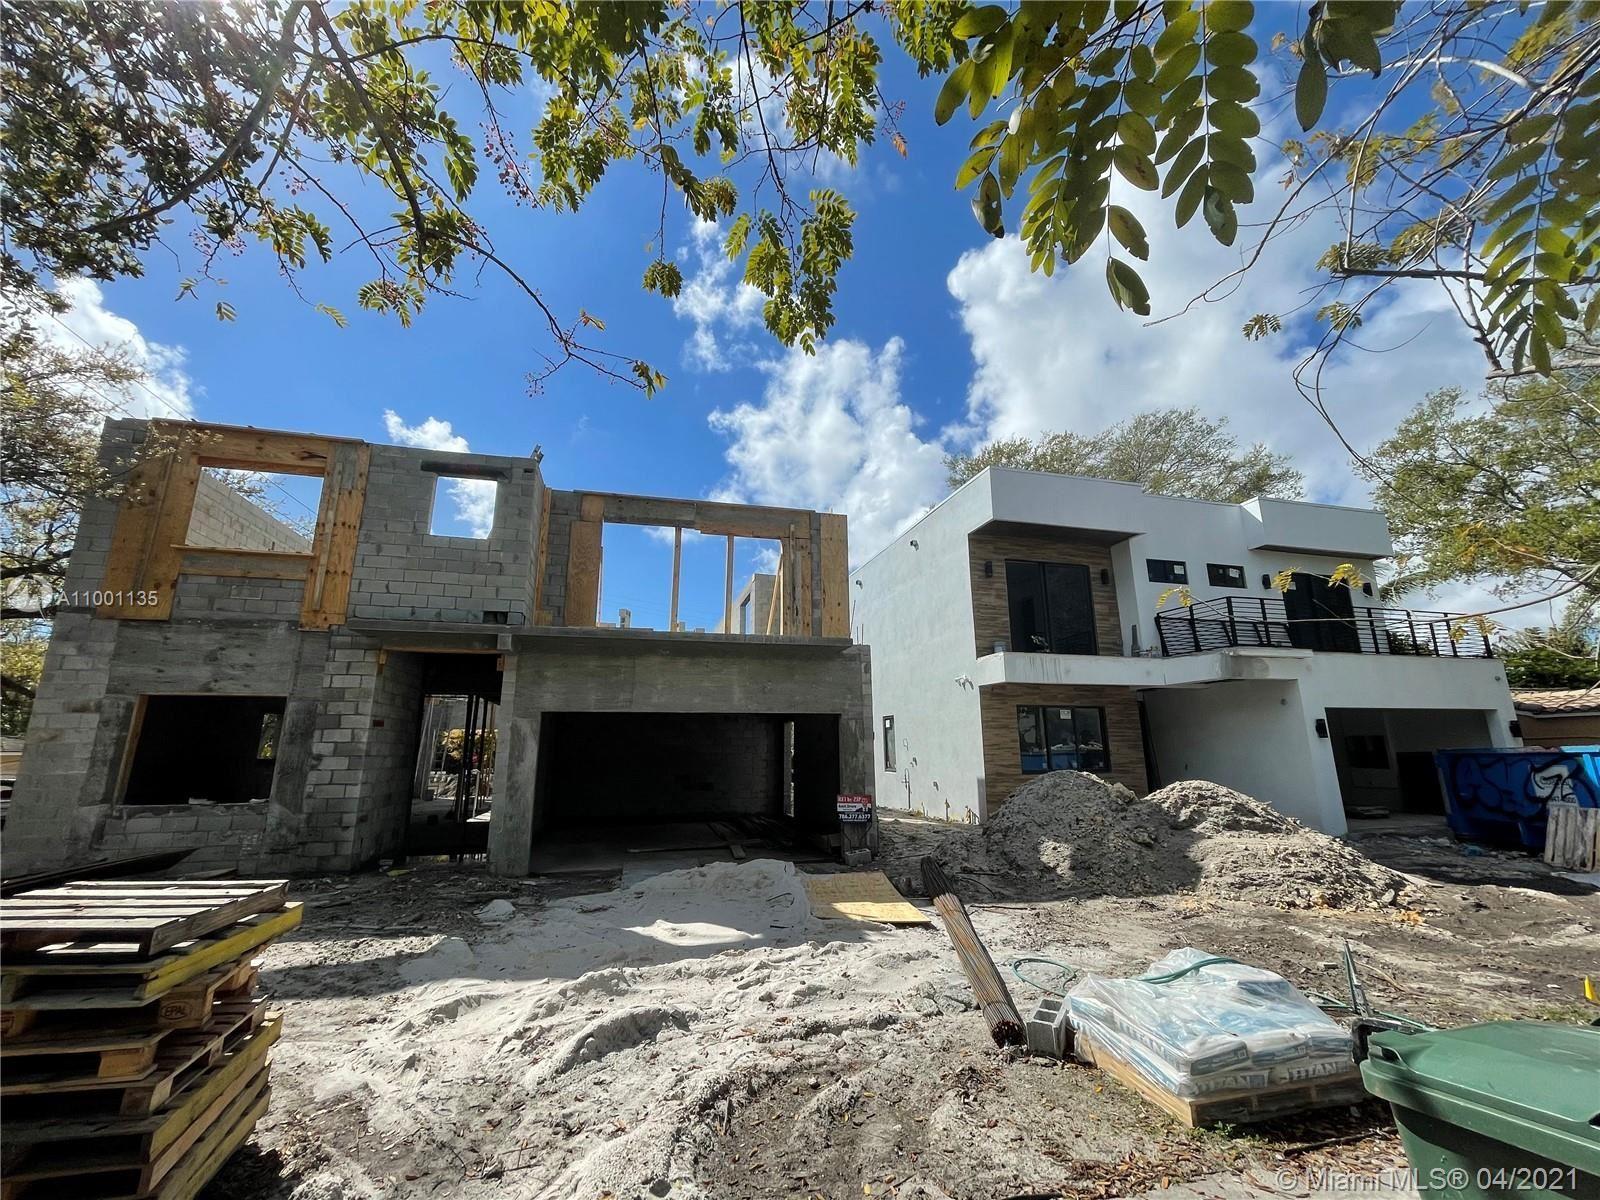 409 NE 17 avenue, Fort Lauderdale, FL 33301 - #: A11001135